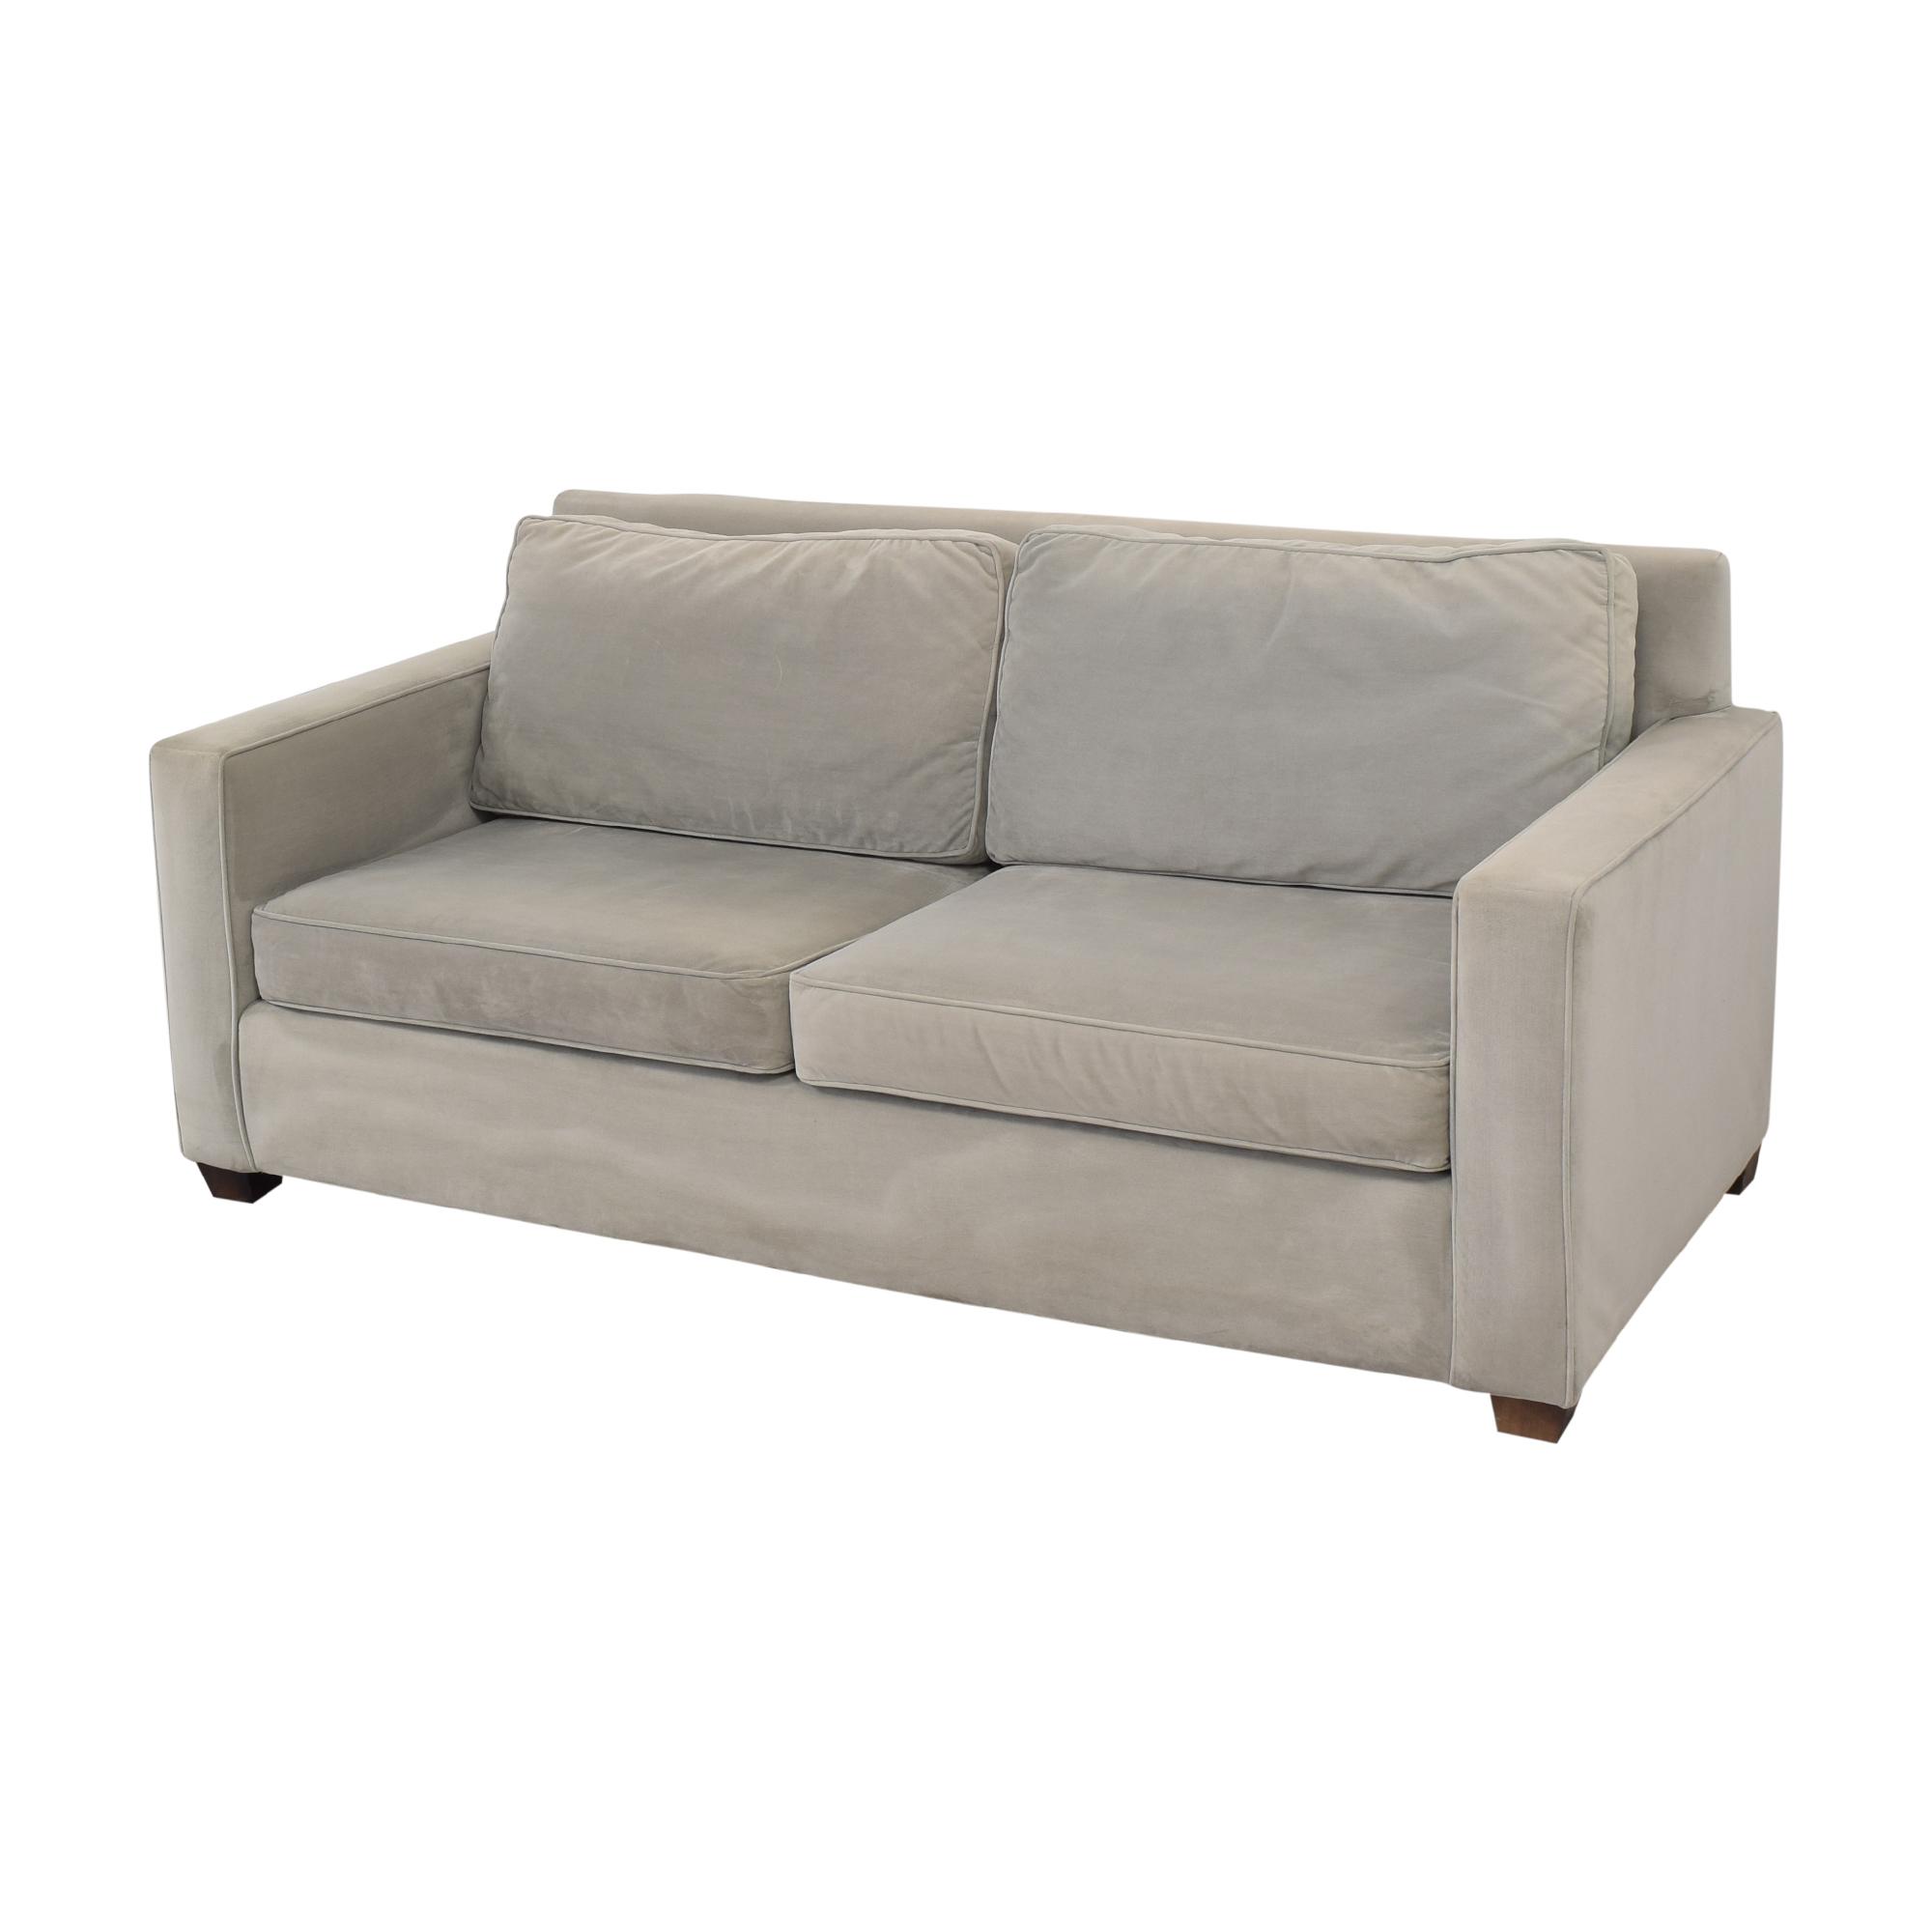 Williams Sonoma Williams Sonoma Two Cushion Sofa Classic Sofas